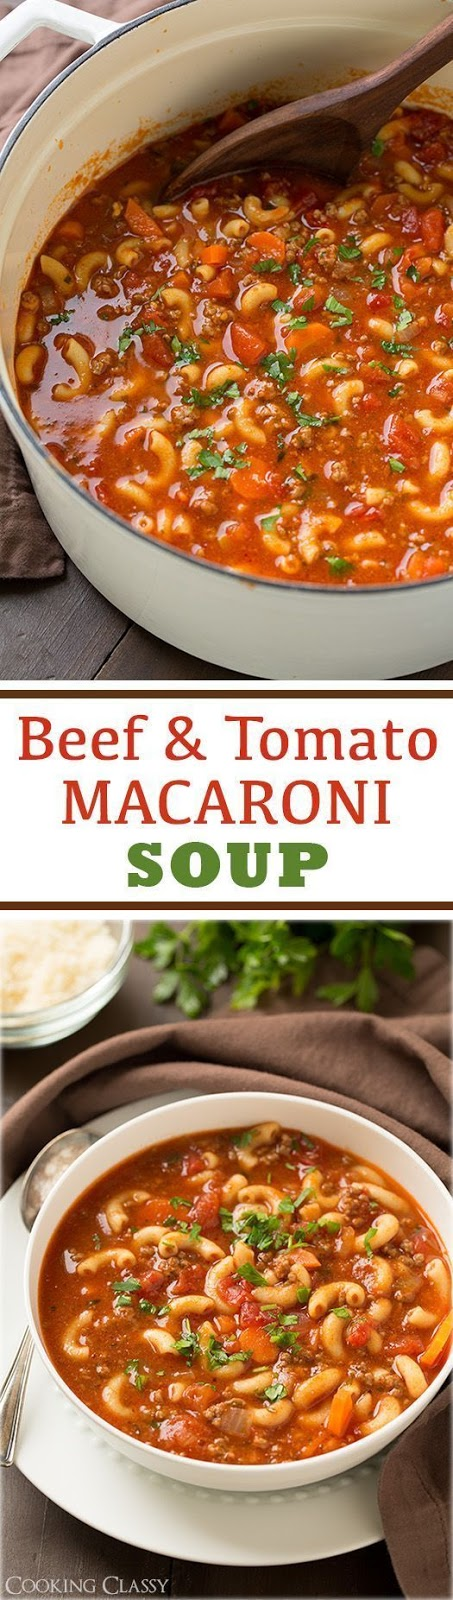 Beef and Tomato Macaroni Soup Recipes